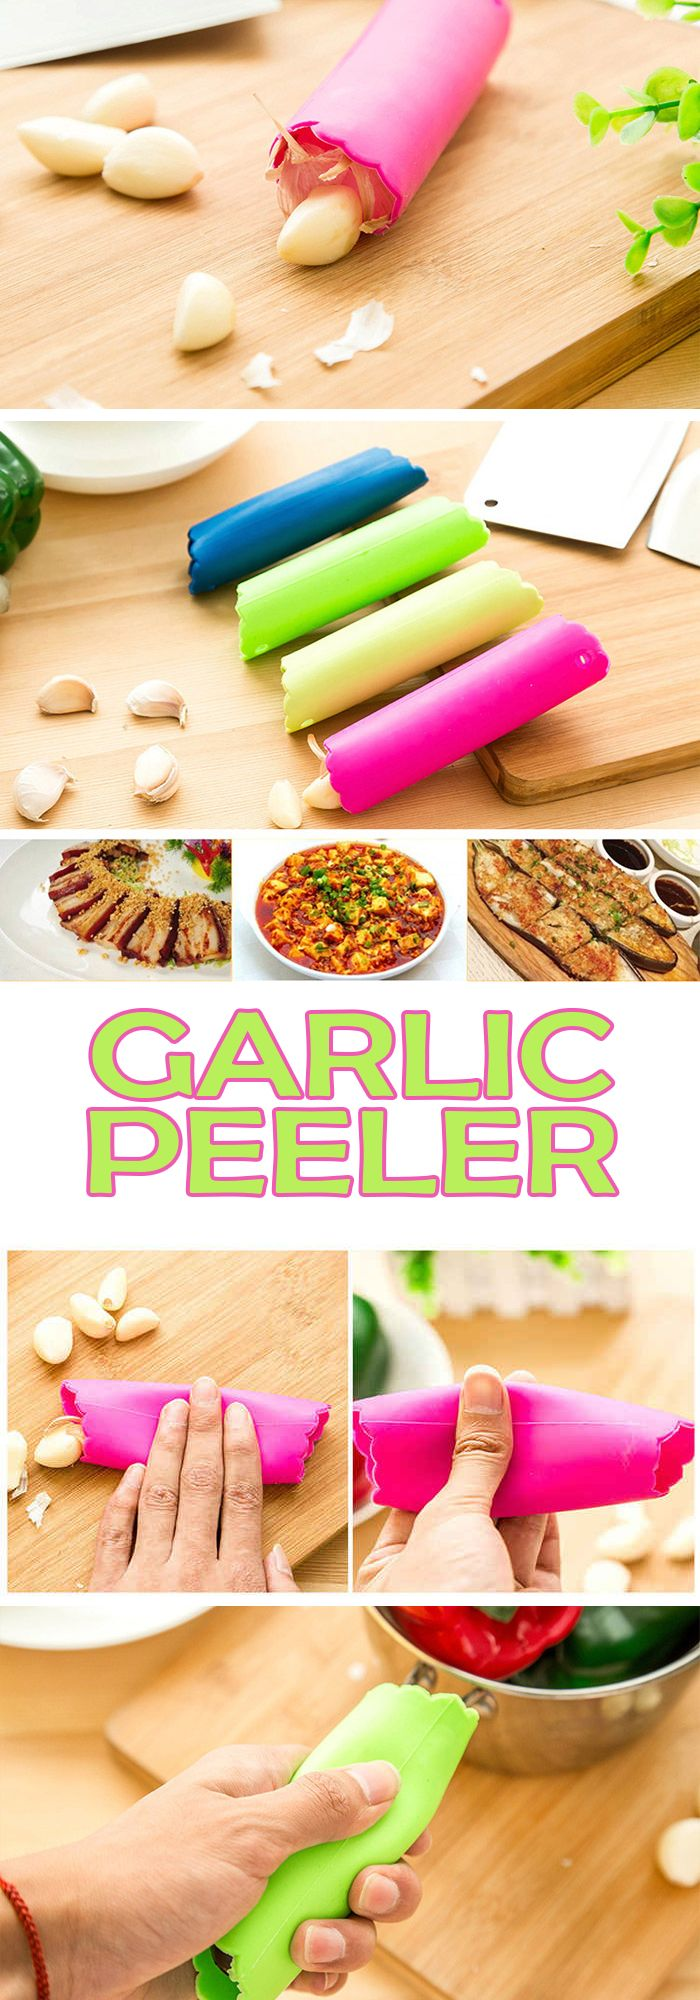 Handy garlic peeler kitchen tool